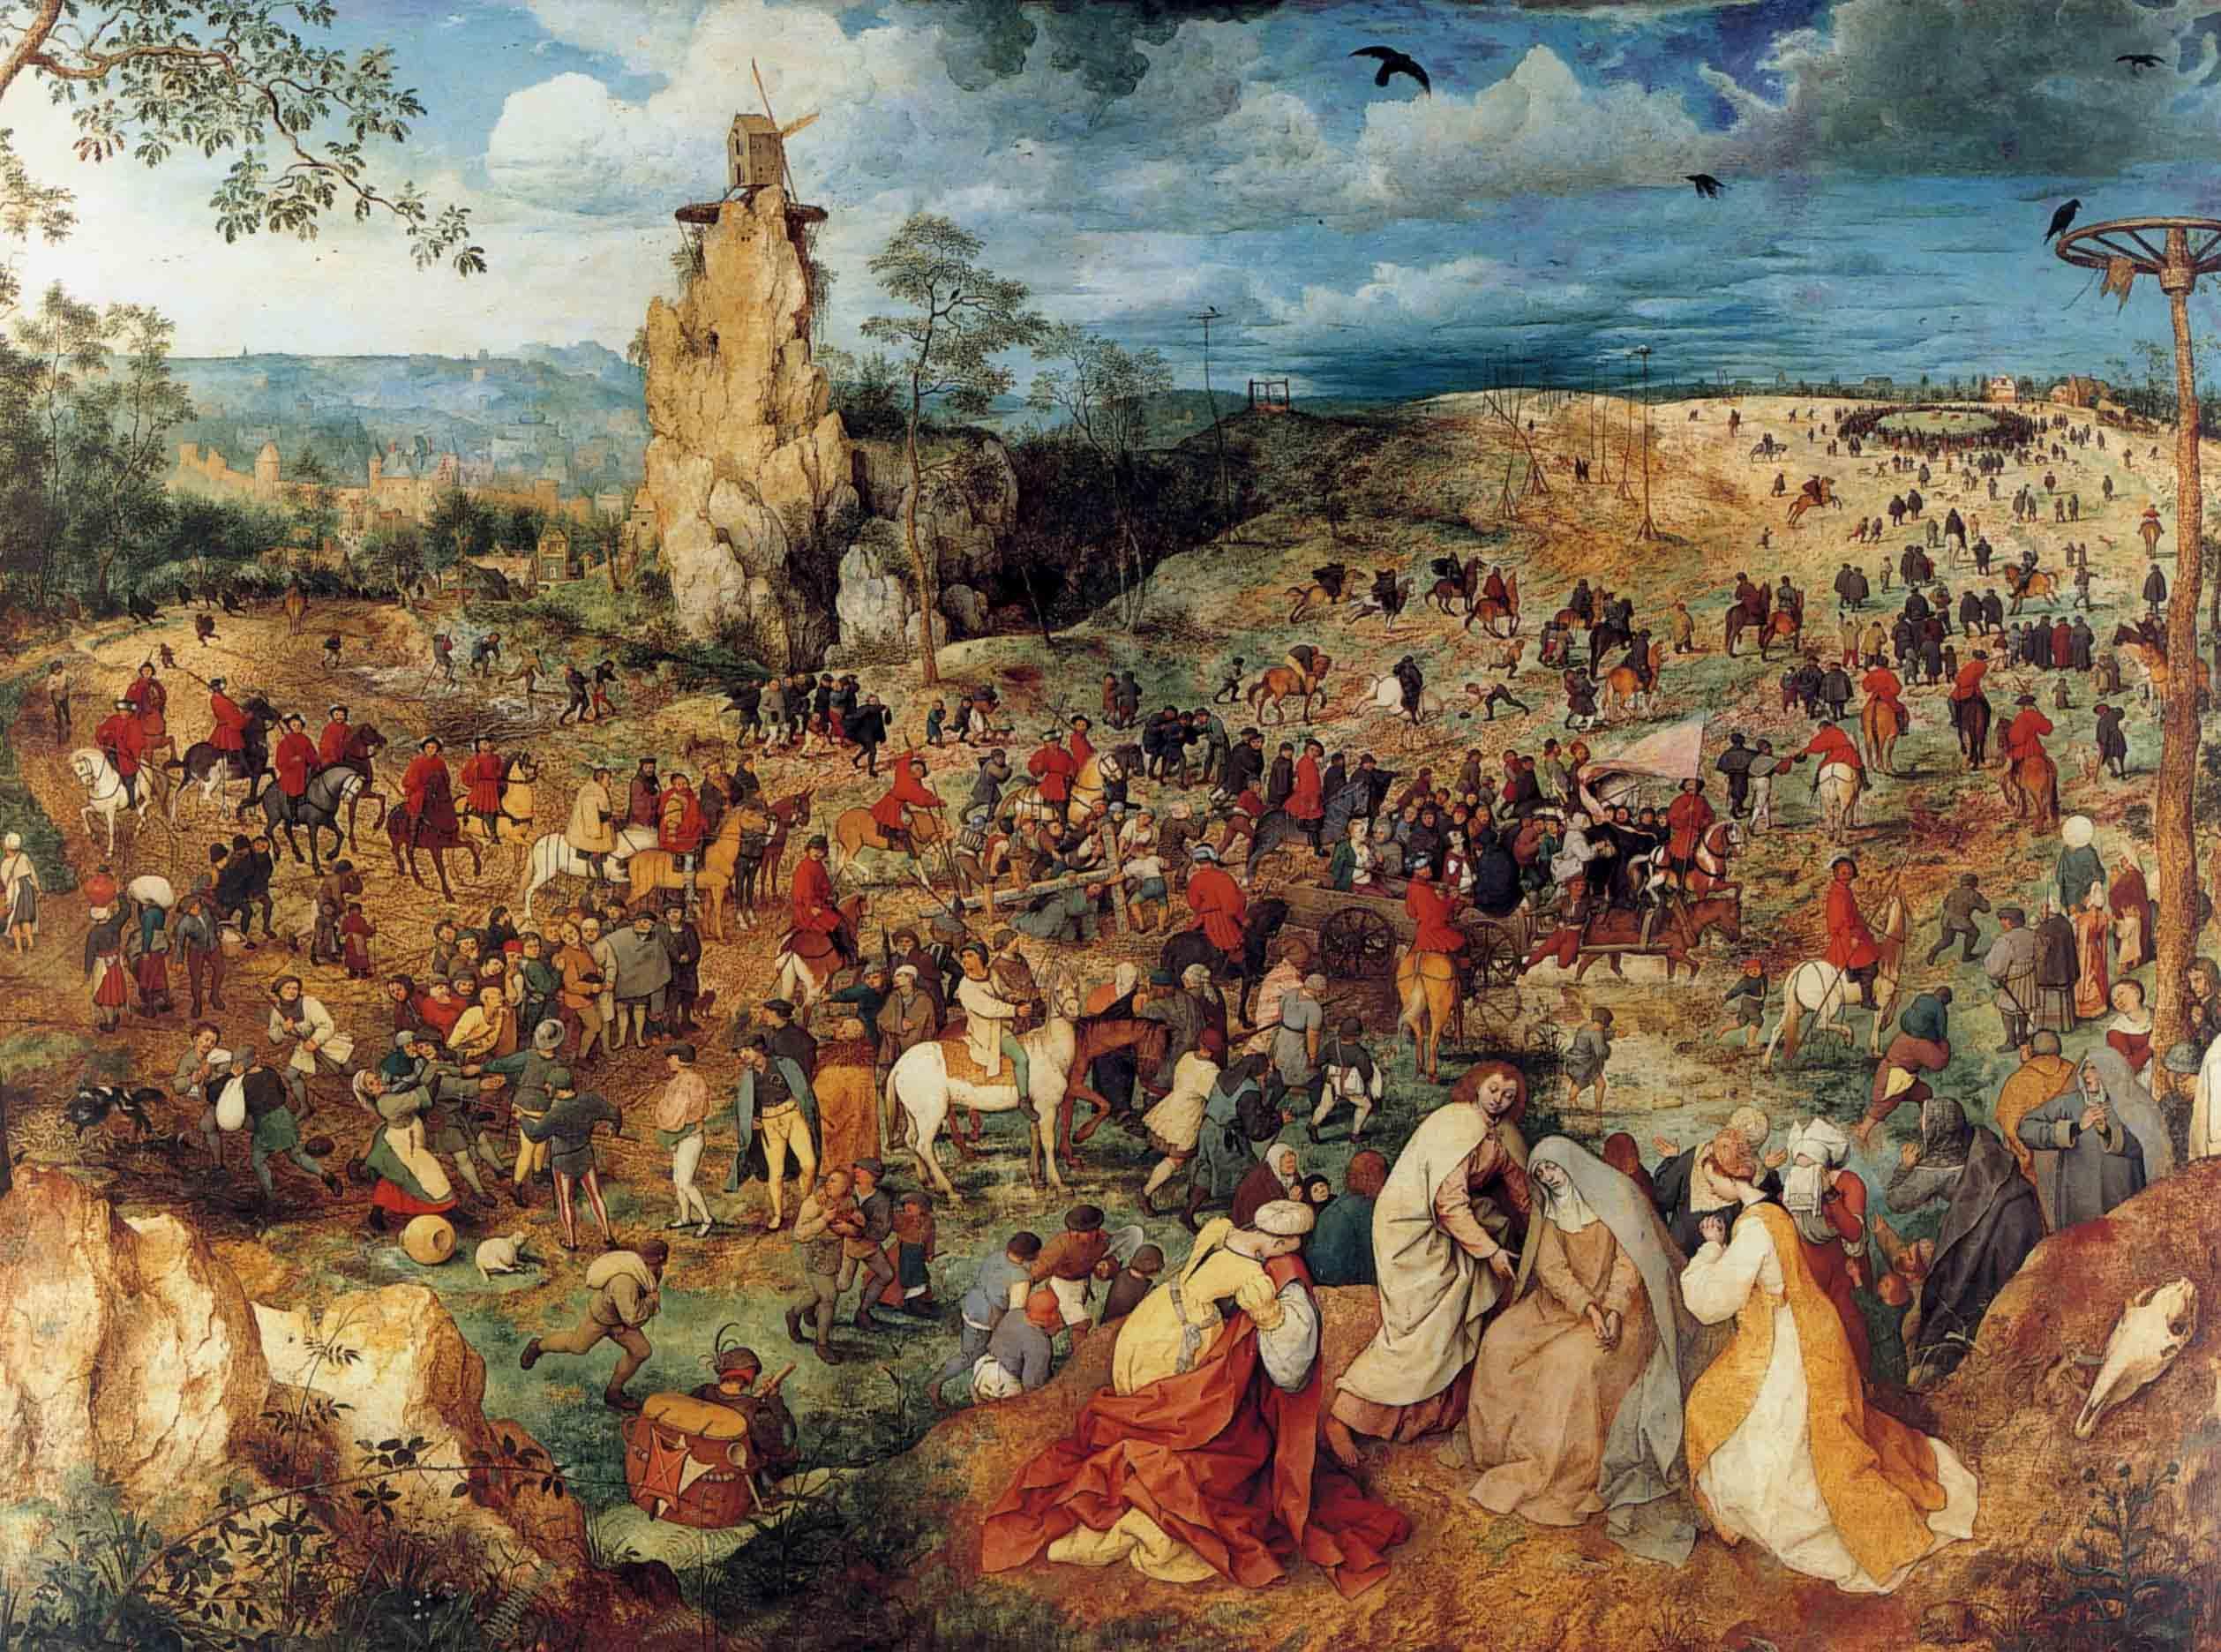 1564 Pieter Bruegel The Elder The Procession To Calvary On Wood 124x170cm Jpg 2 517 1 872 Pixeles Brueghel L Ancien Peinture Celebre Peinture Renaissance